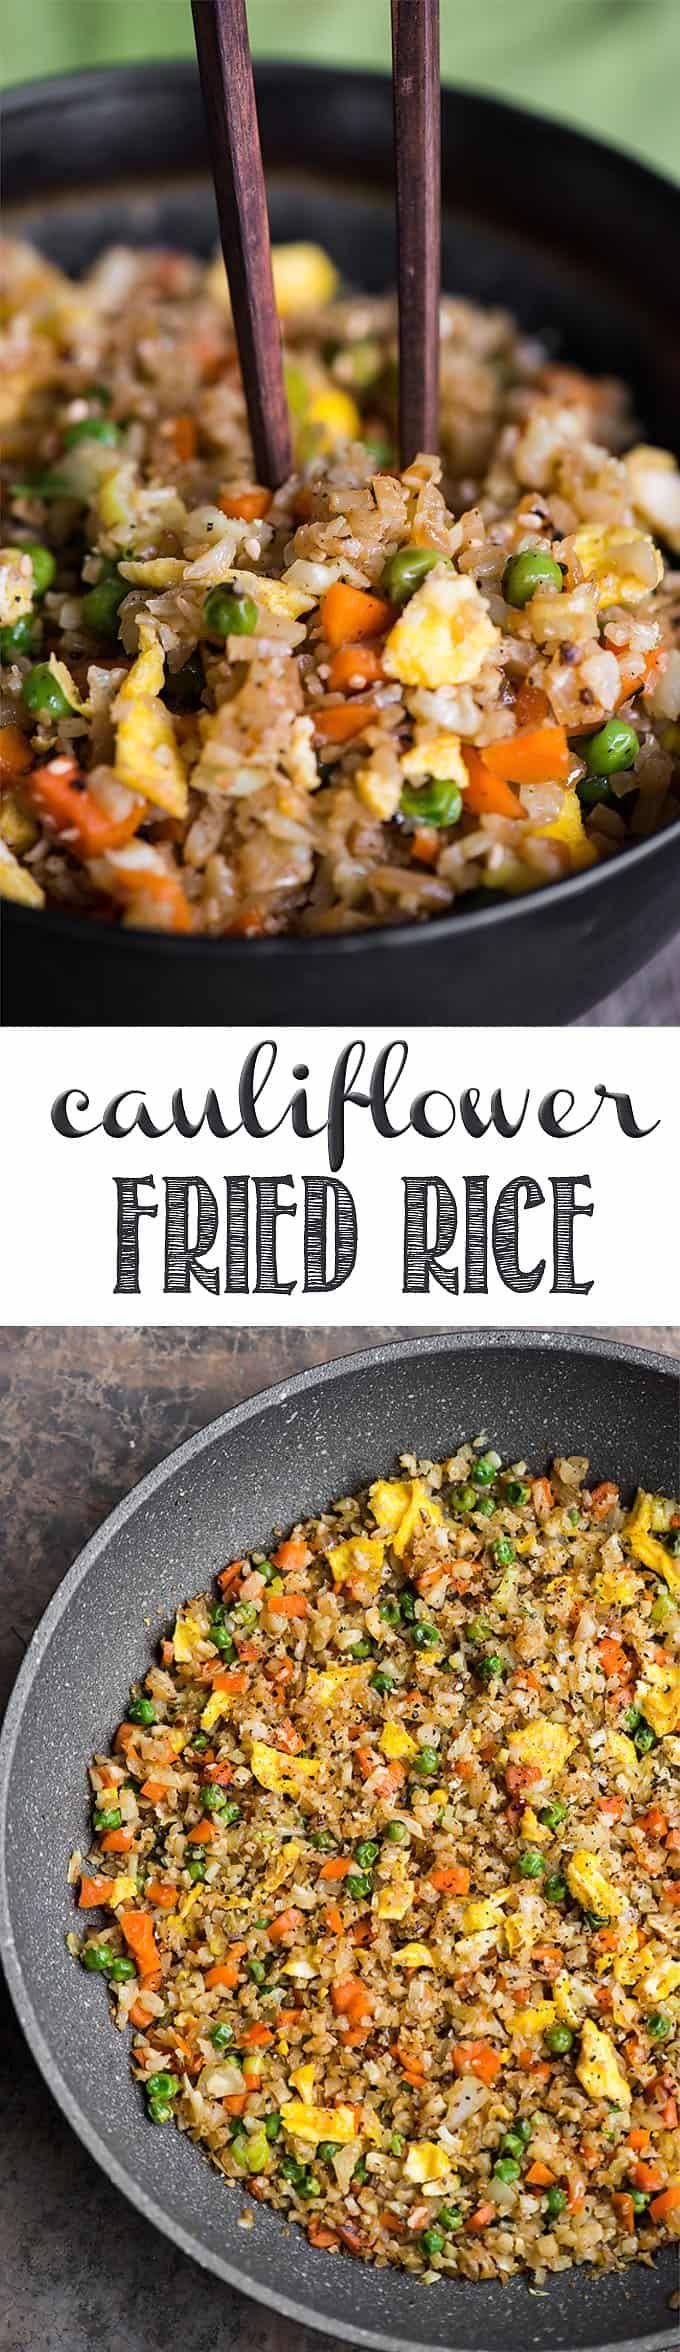 Cauliflower Fried Rice Recipe   Self Proclaimed Foodie